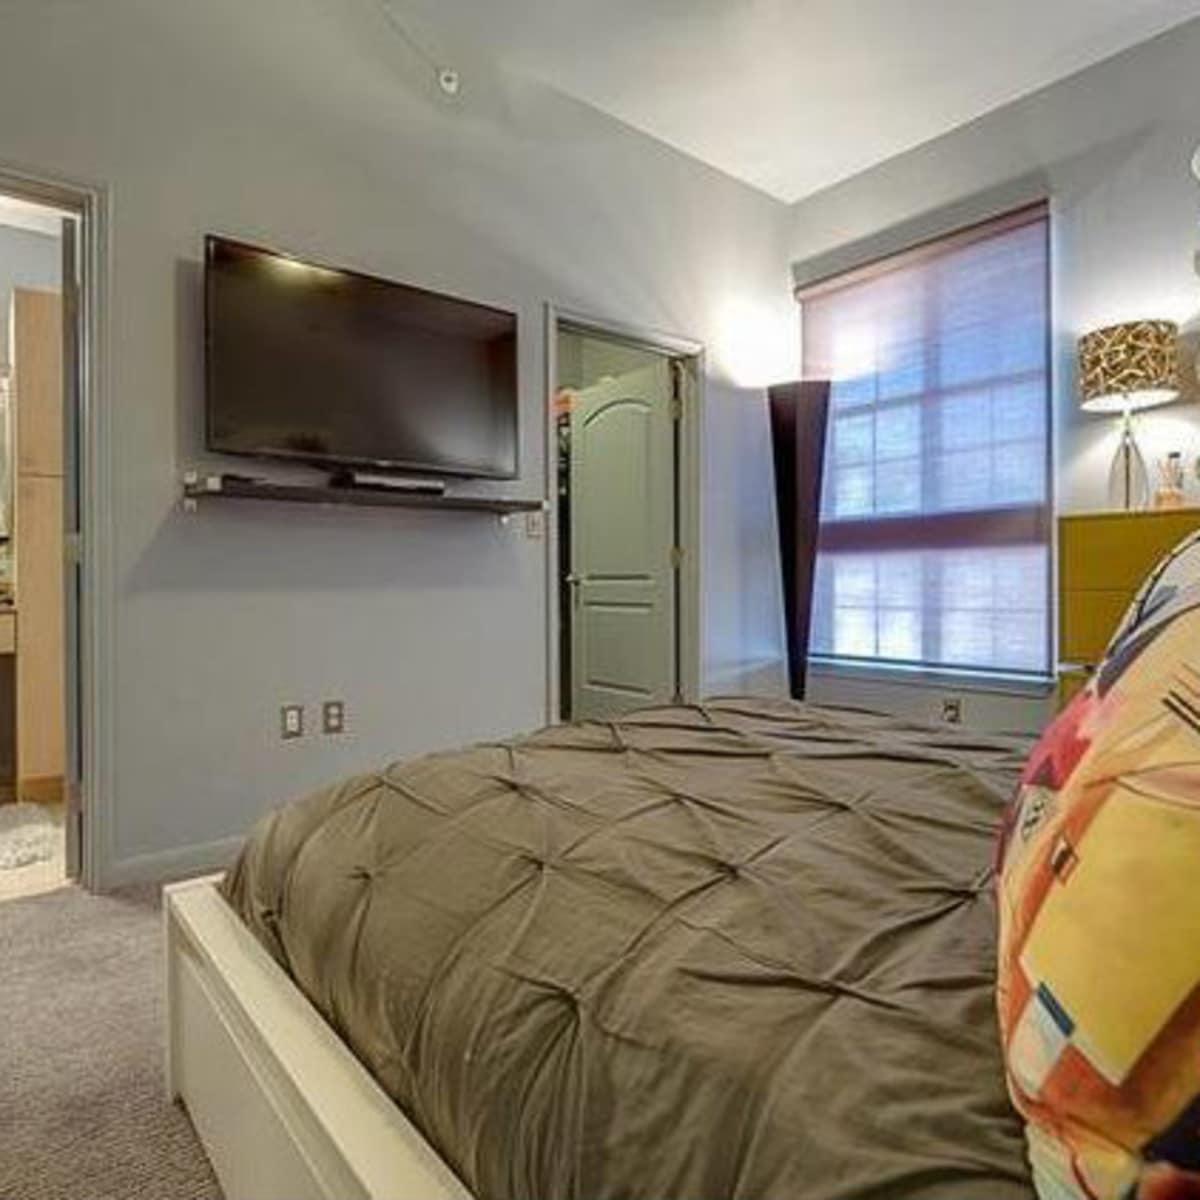 3225 Turtle Creek Blvd bedroom